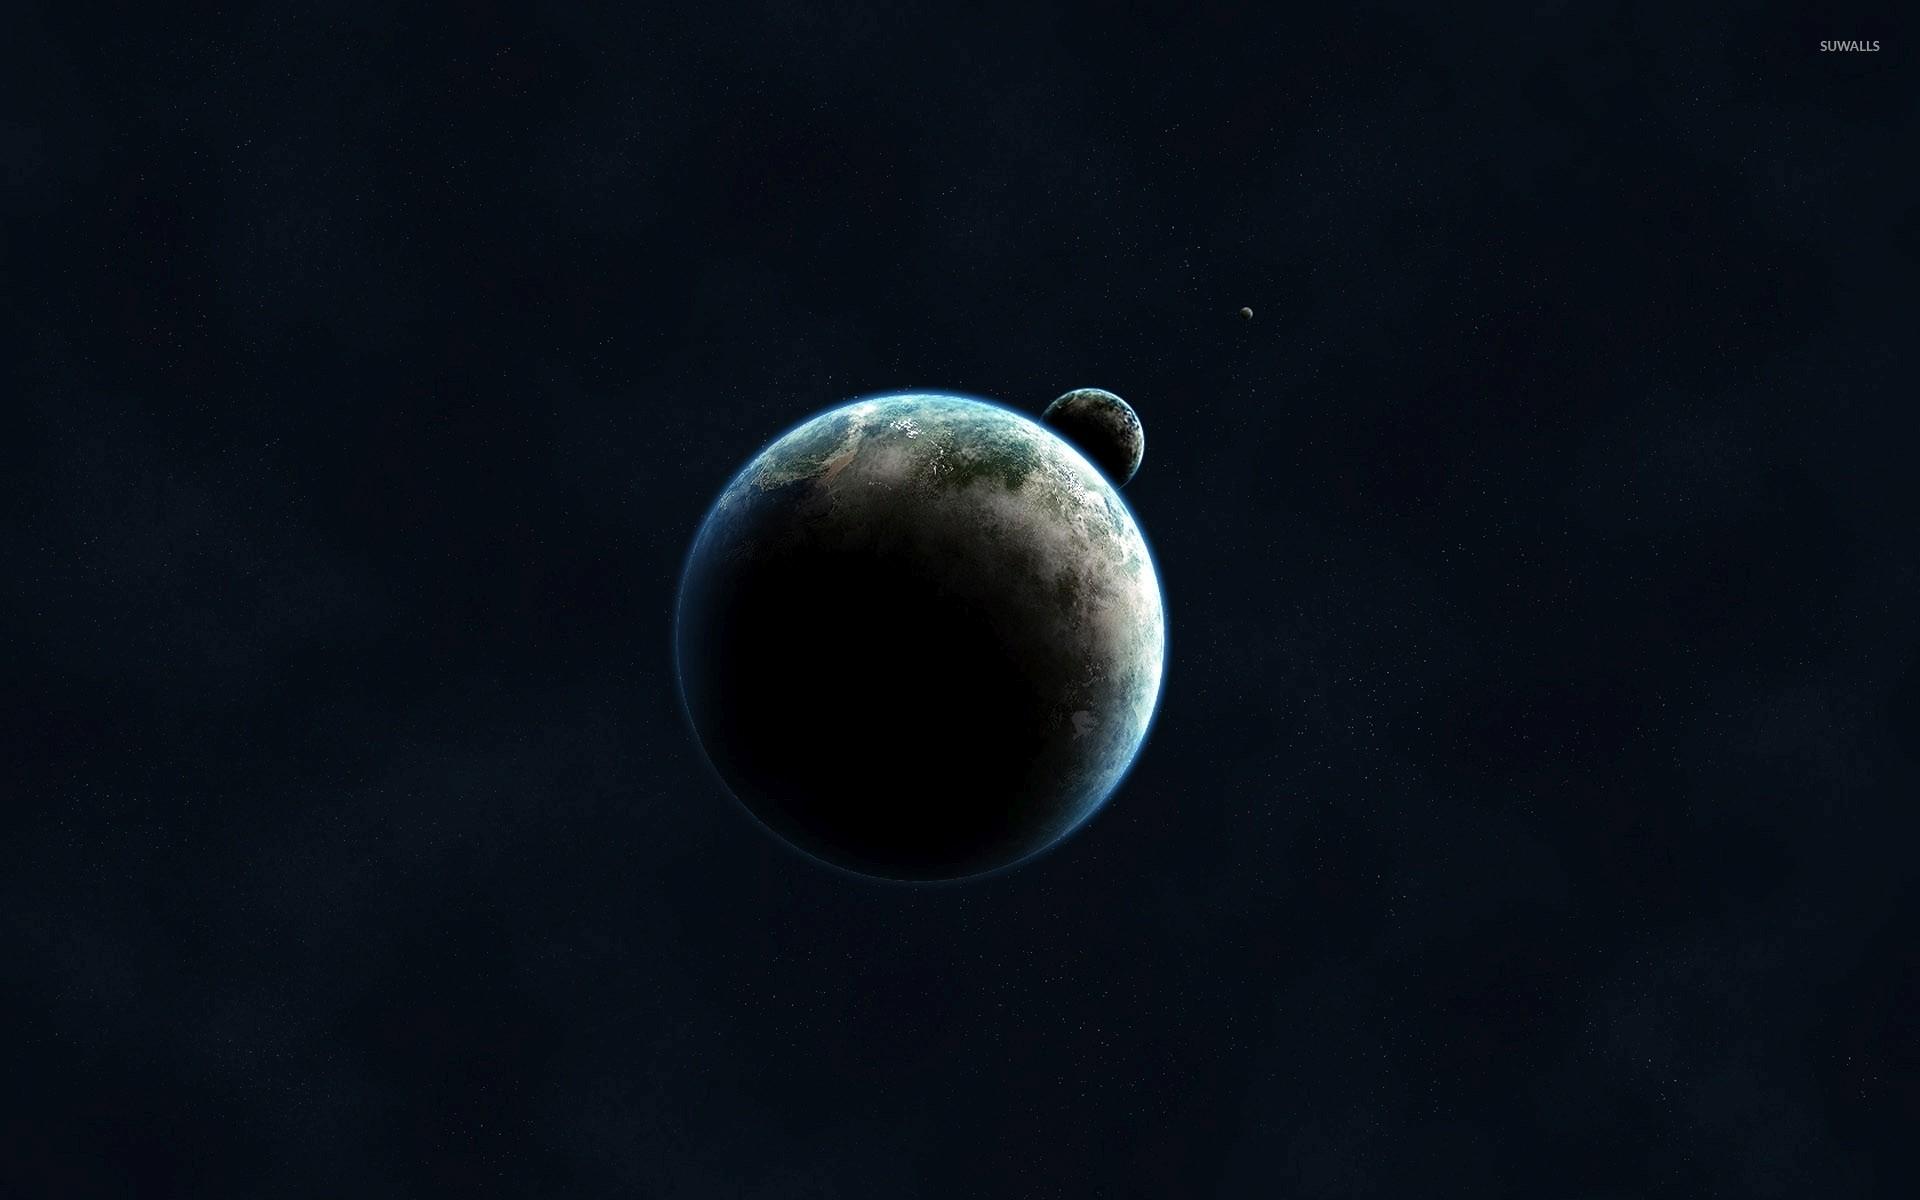 Planets in space [2] wallpaper jpg